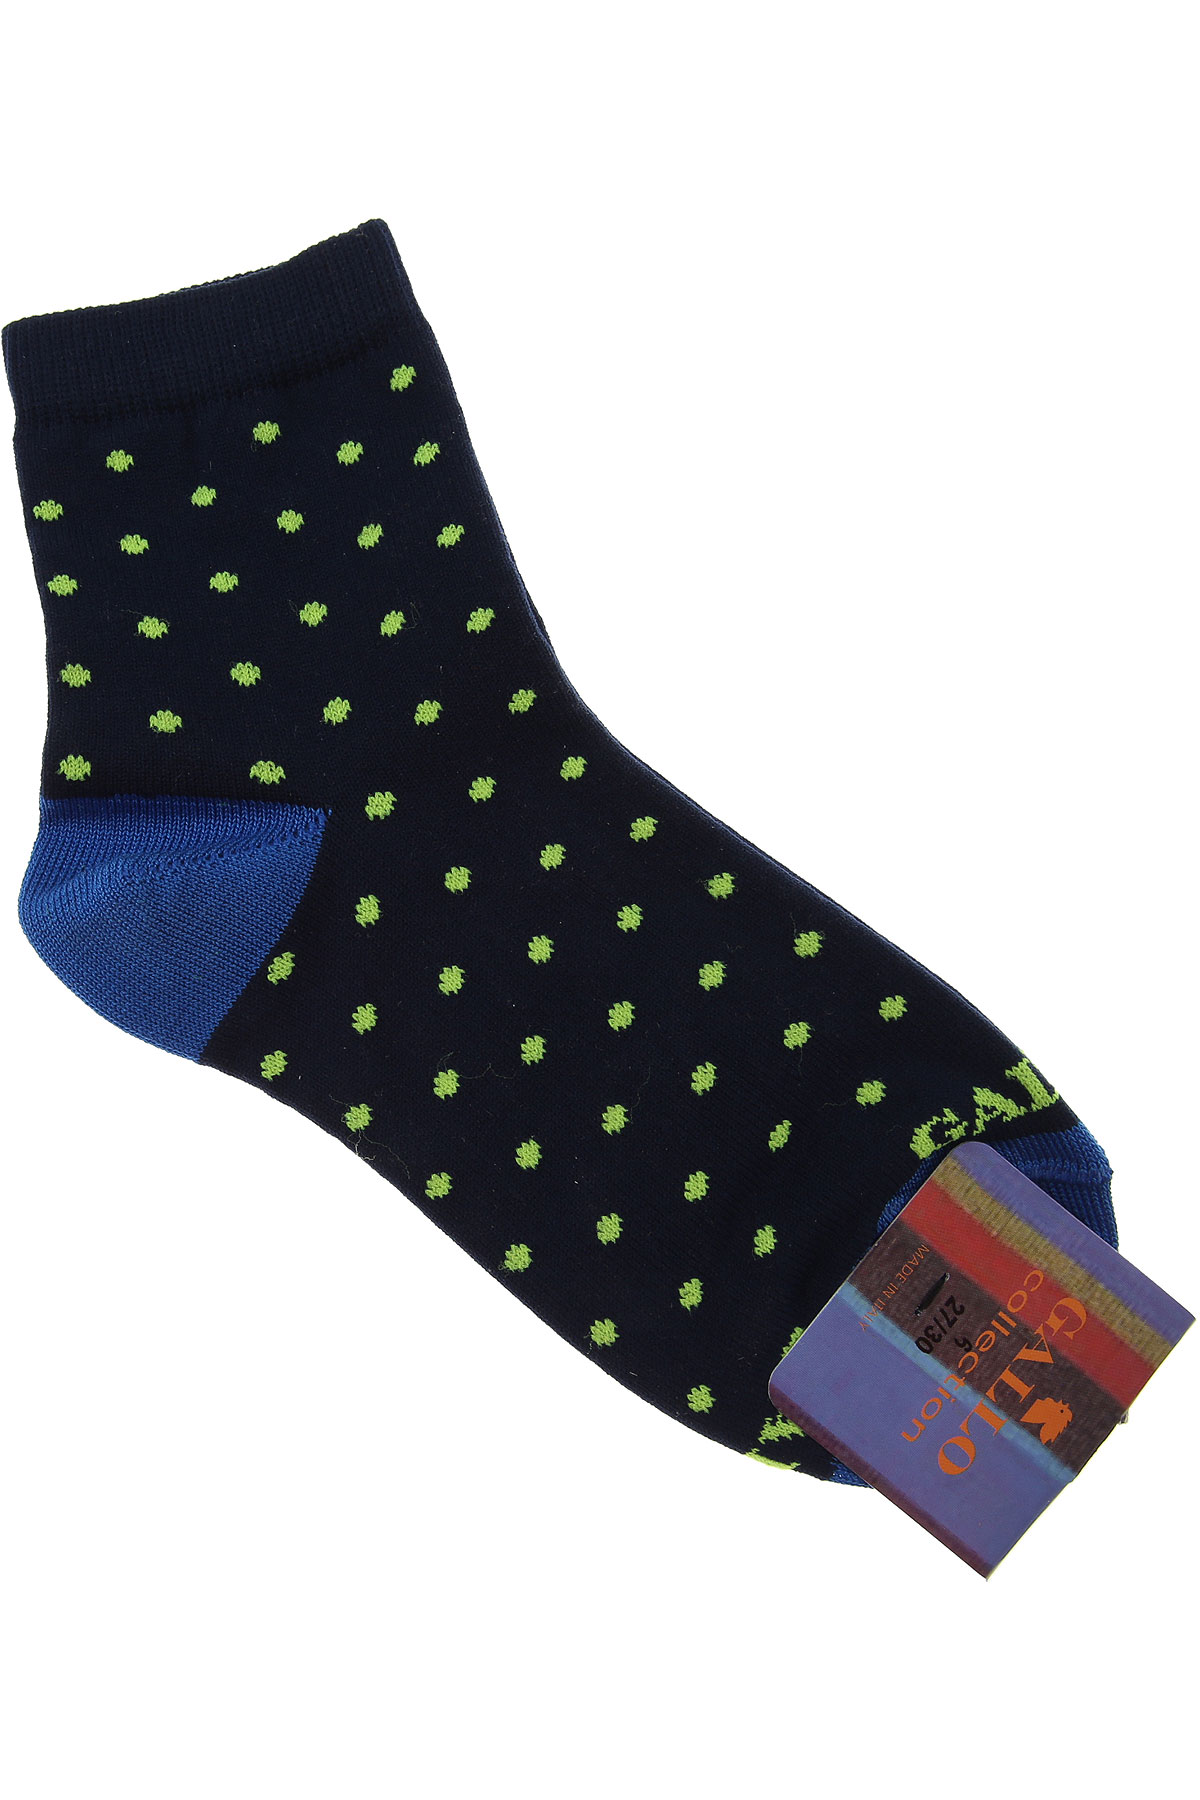 Gallo Kids Shoes for Boys On Sale, Blue, polyamide, 2019, 2 (Ita 19-22) 4 (Ita 23-26) 6 (Ita 27-30)